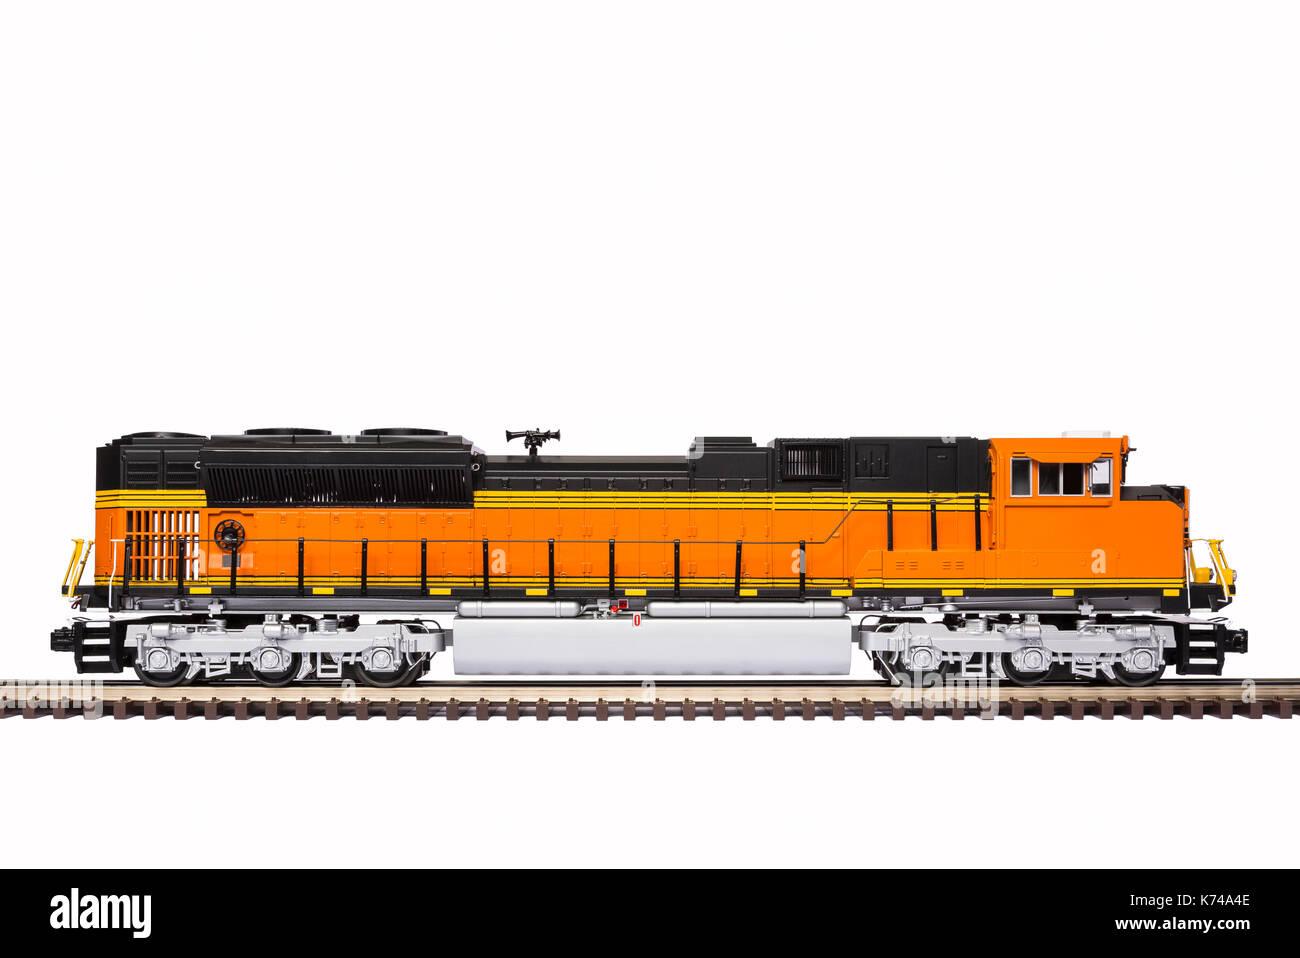 Railroad Train Locomotive - Stock Image